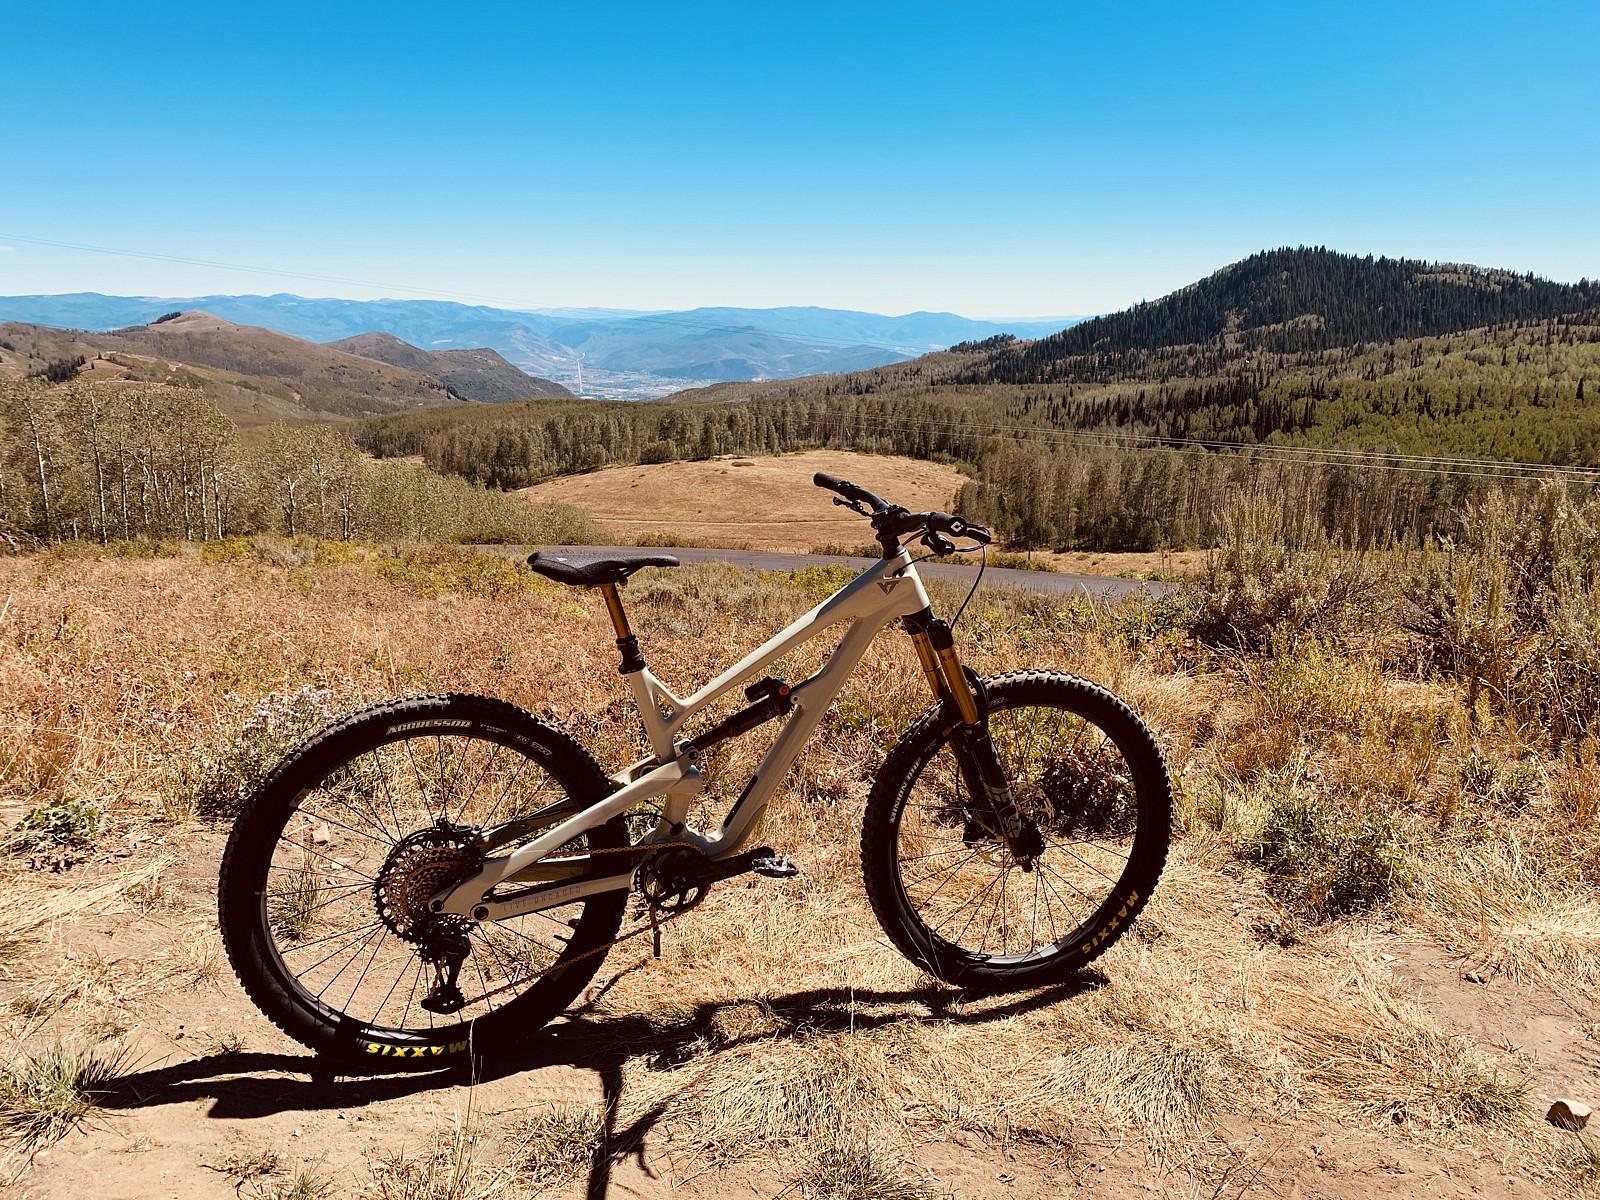 IMG E0202 - jaykalafatis - Mountain Biking Pictures - Vital MTB